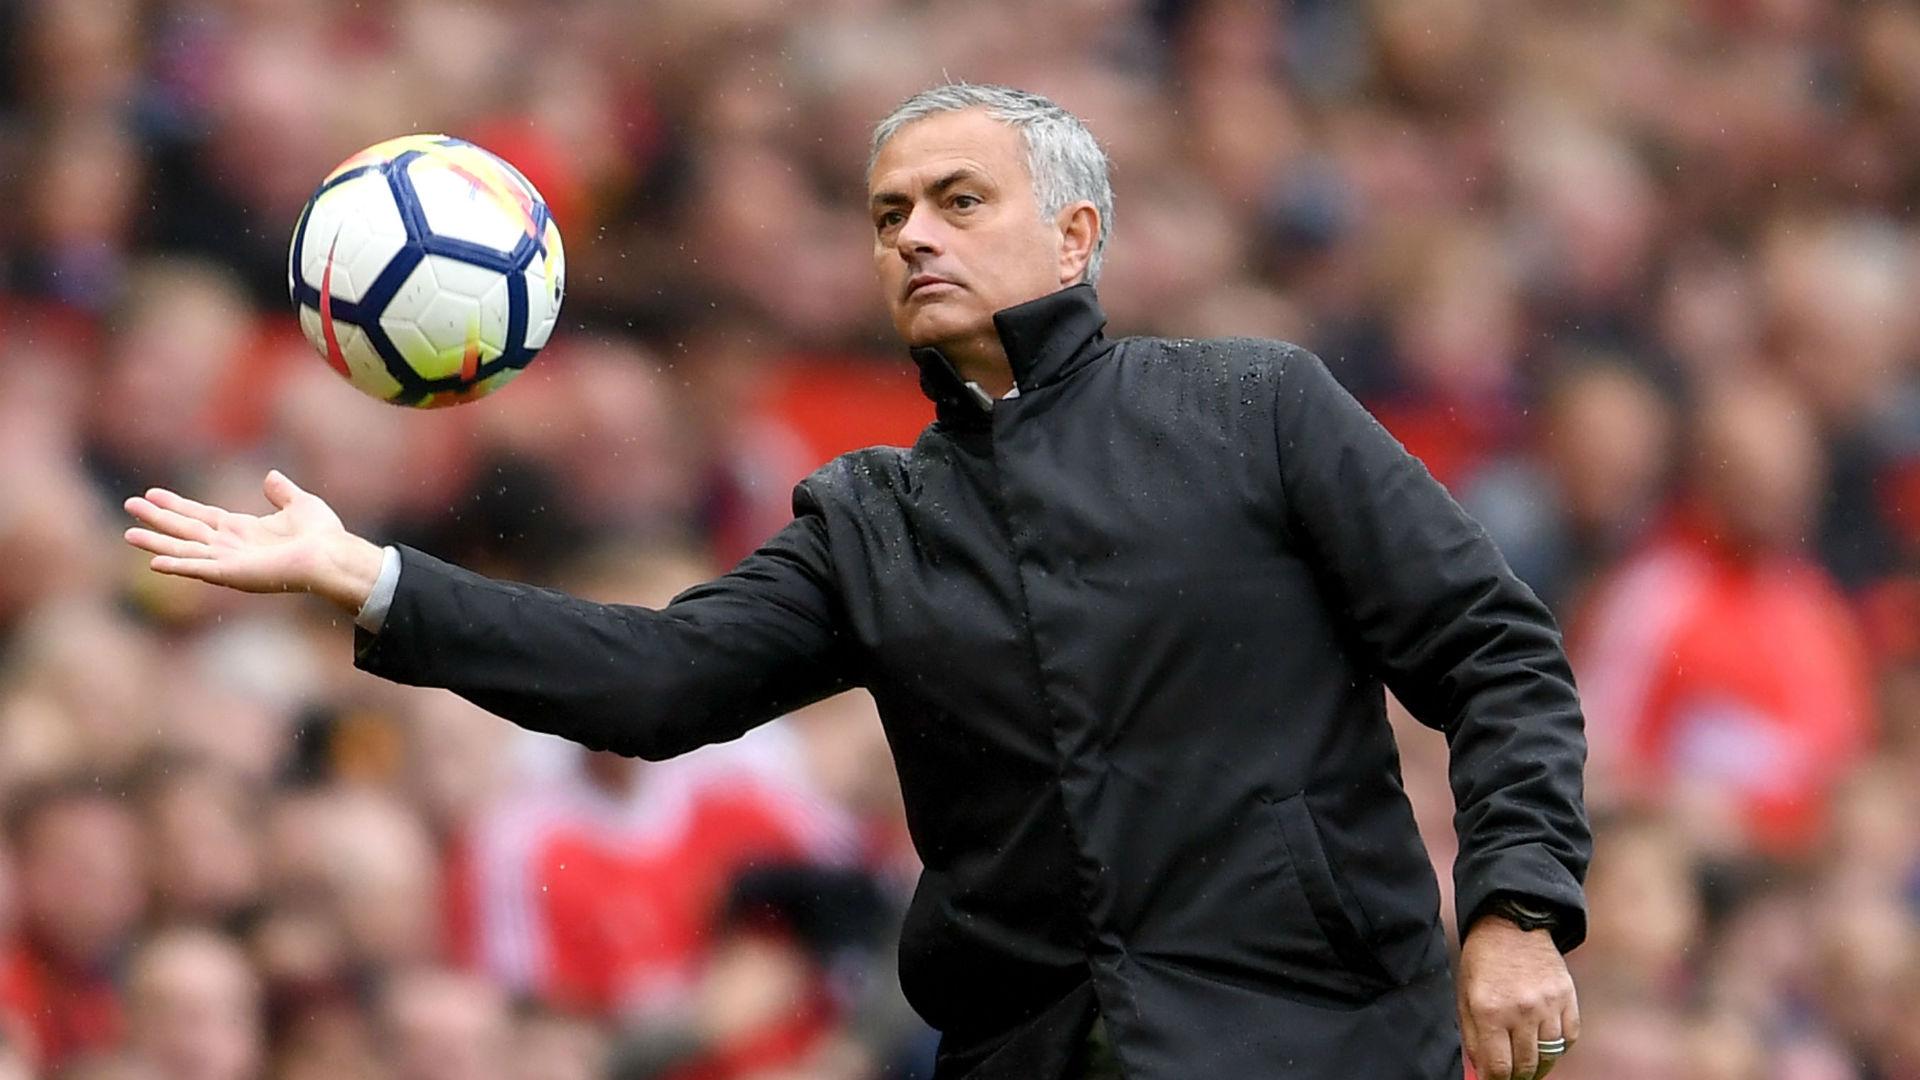 مانشستر يونايتد يقيل جوزيه مورينيو عقب بداية سيئة لموسم الدوري الإنجليزي